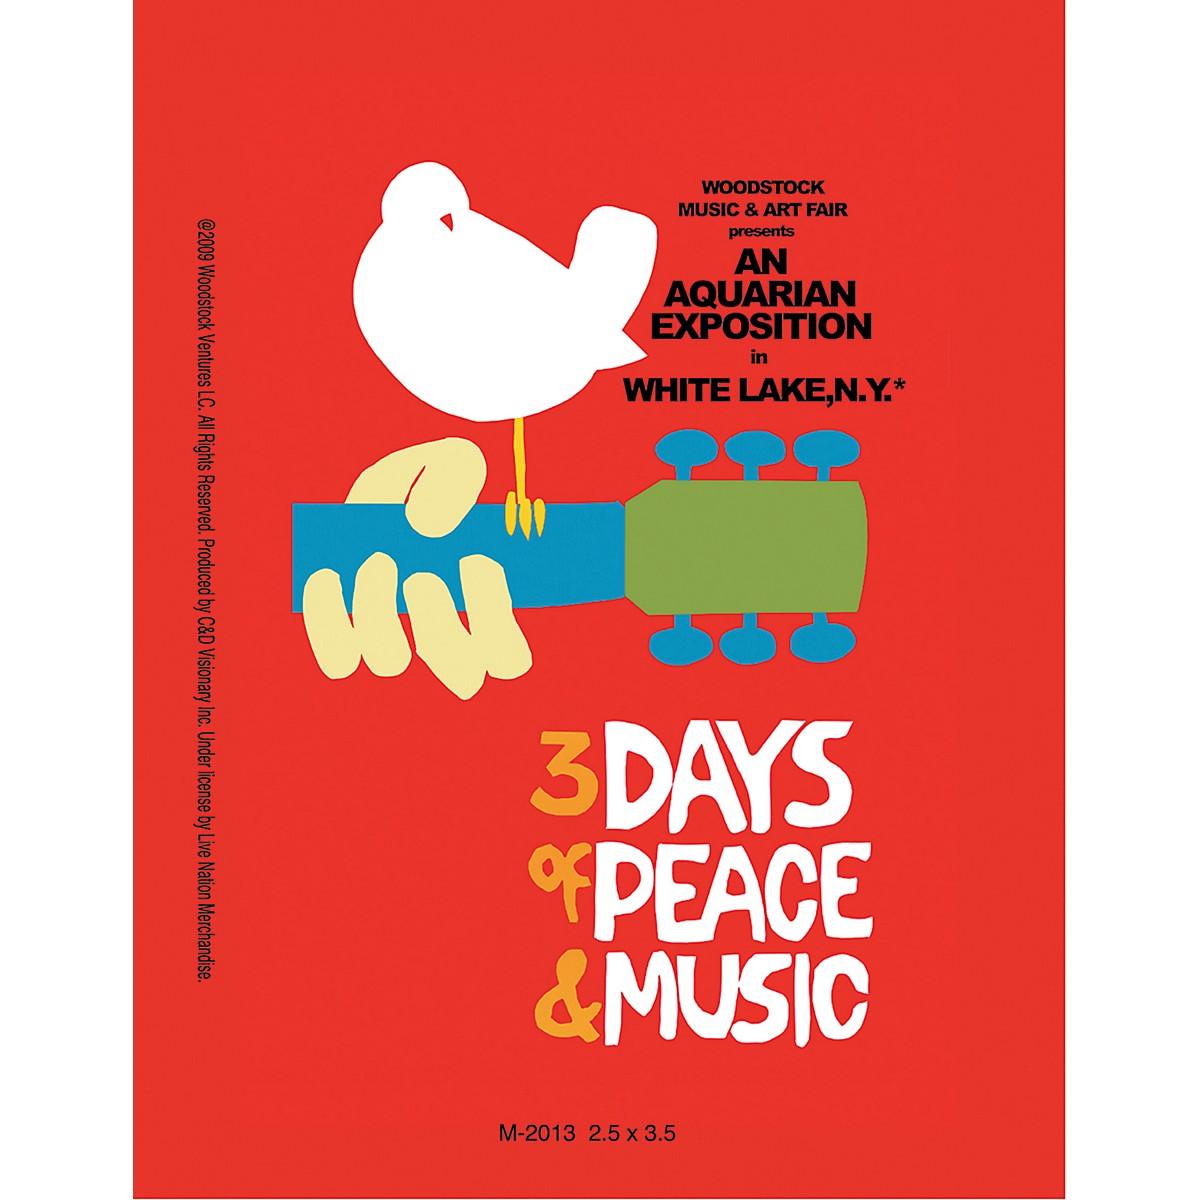 C&D Visionary Woodstock Magnet